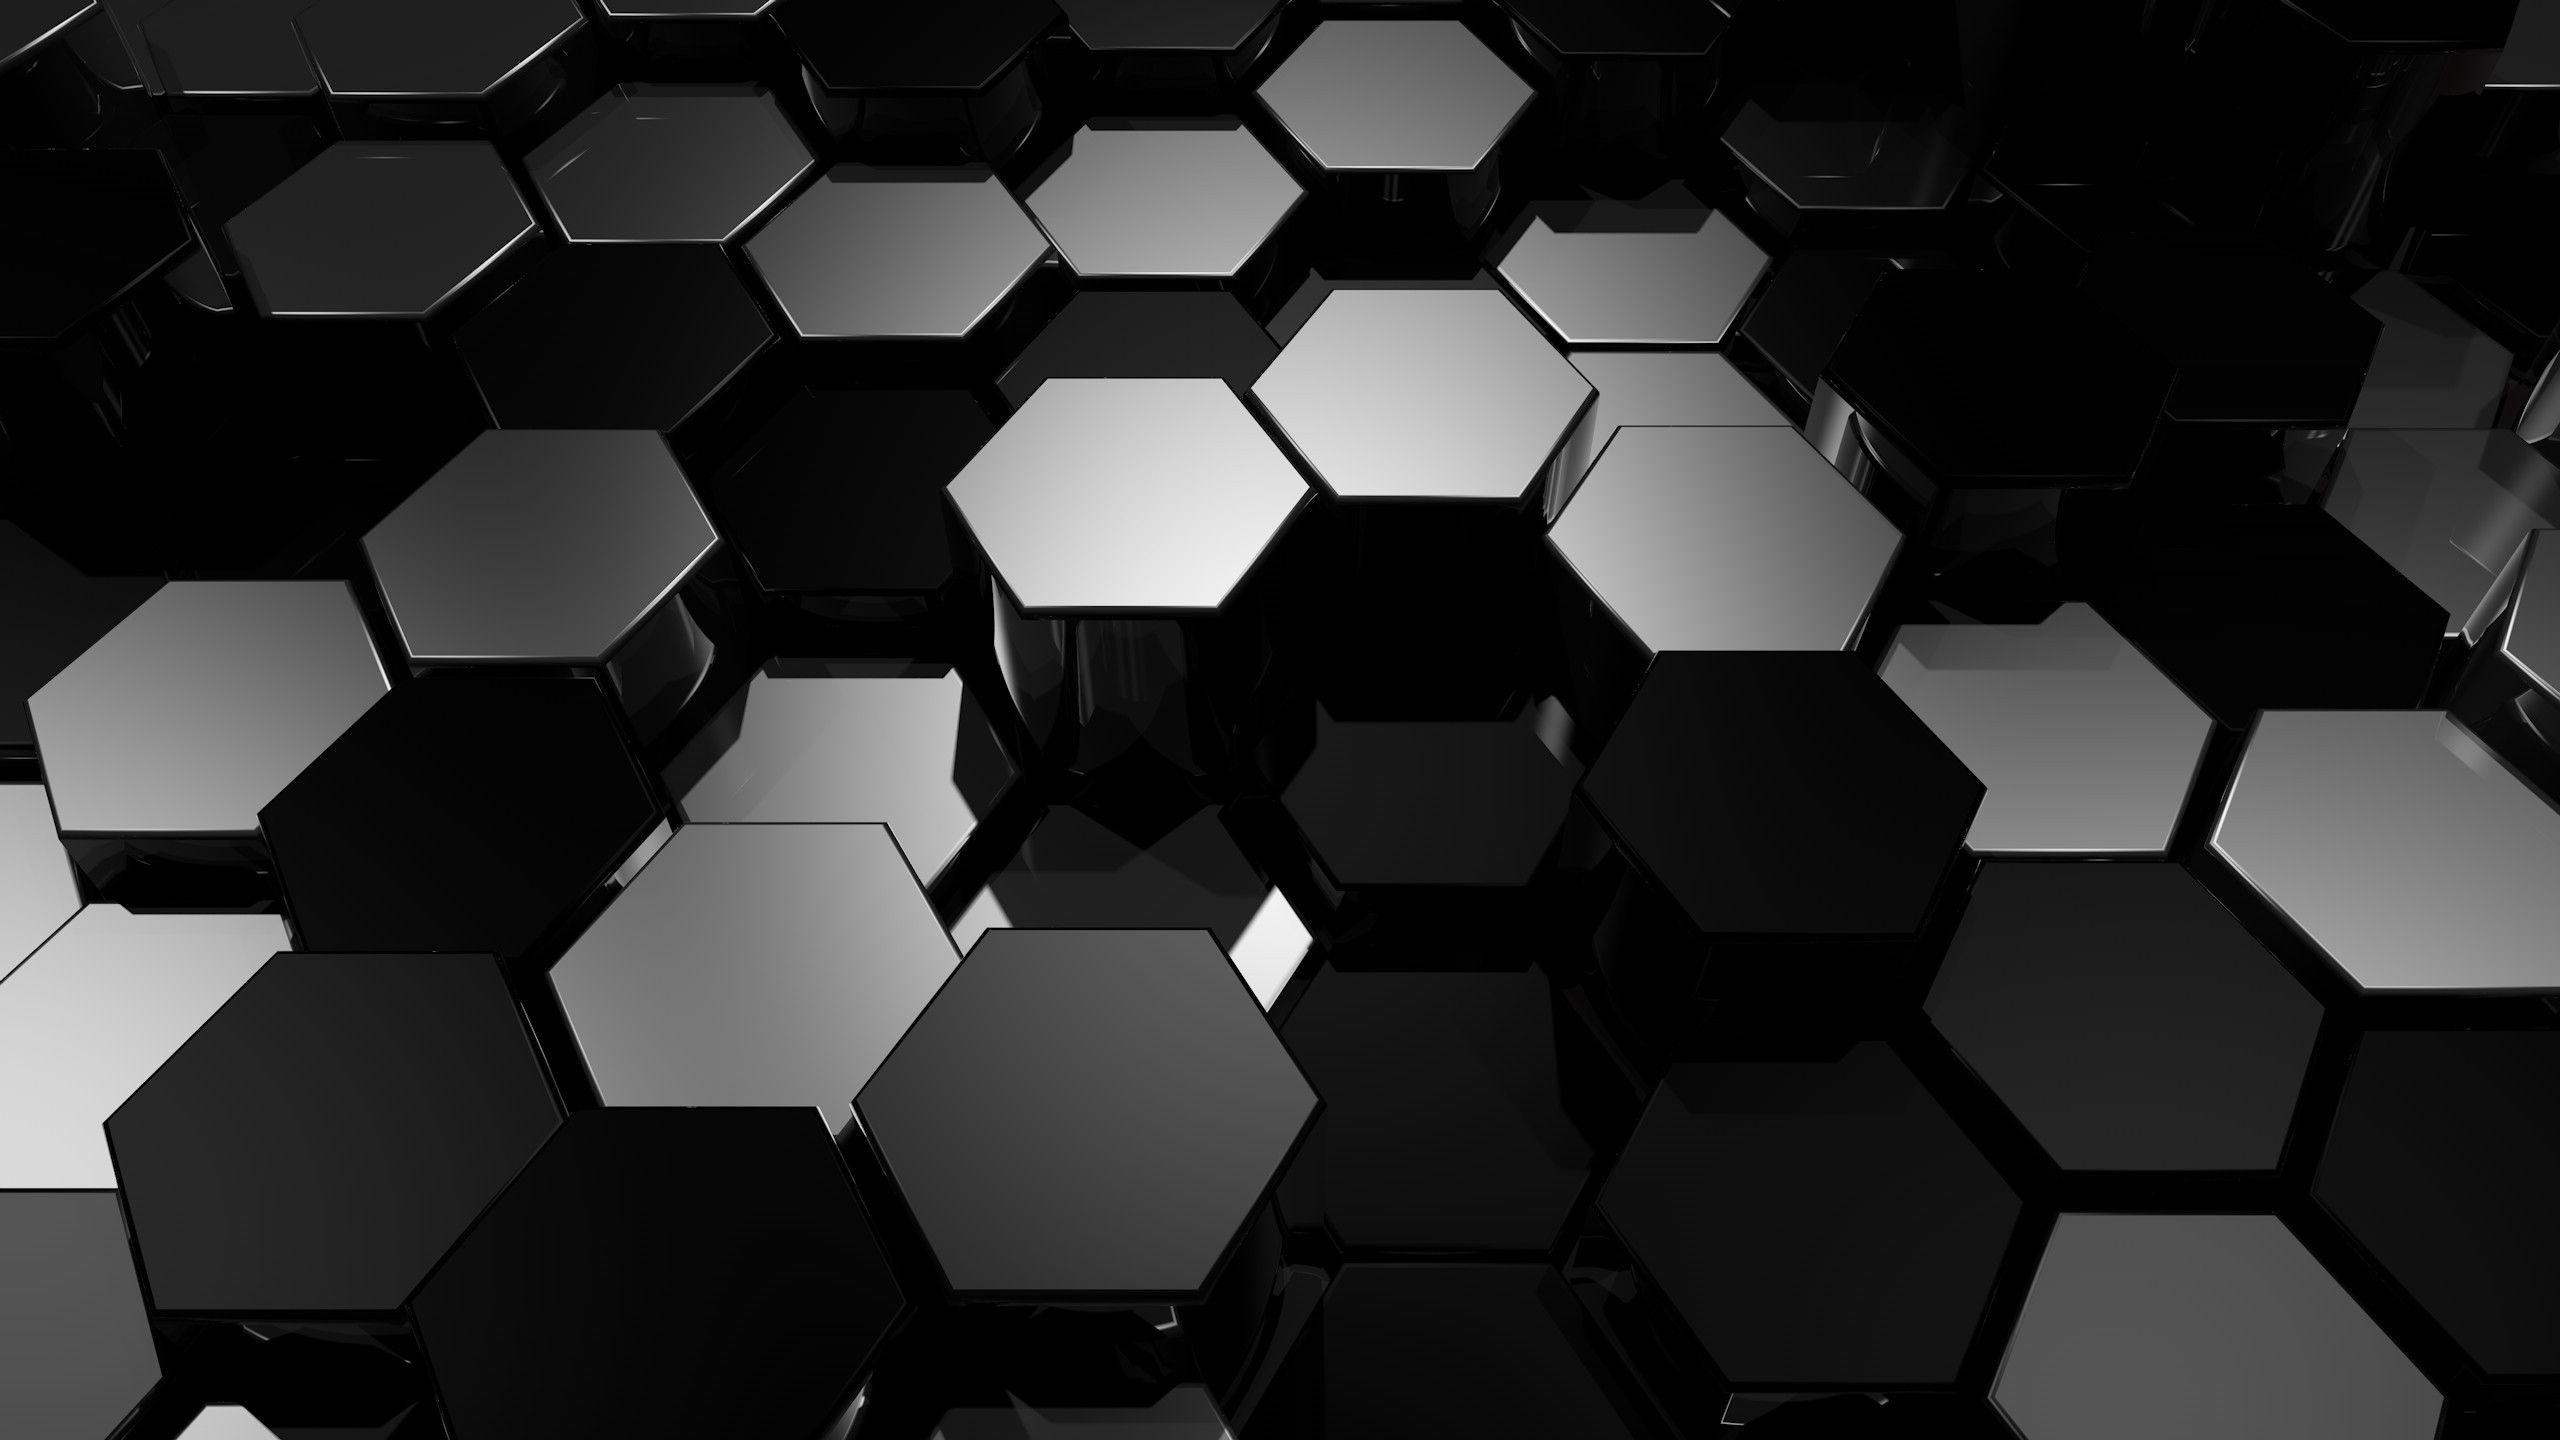 Abstract black desktop wallpaper